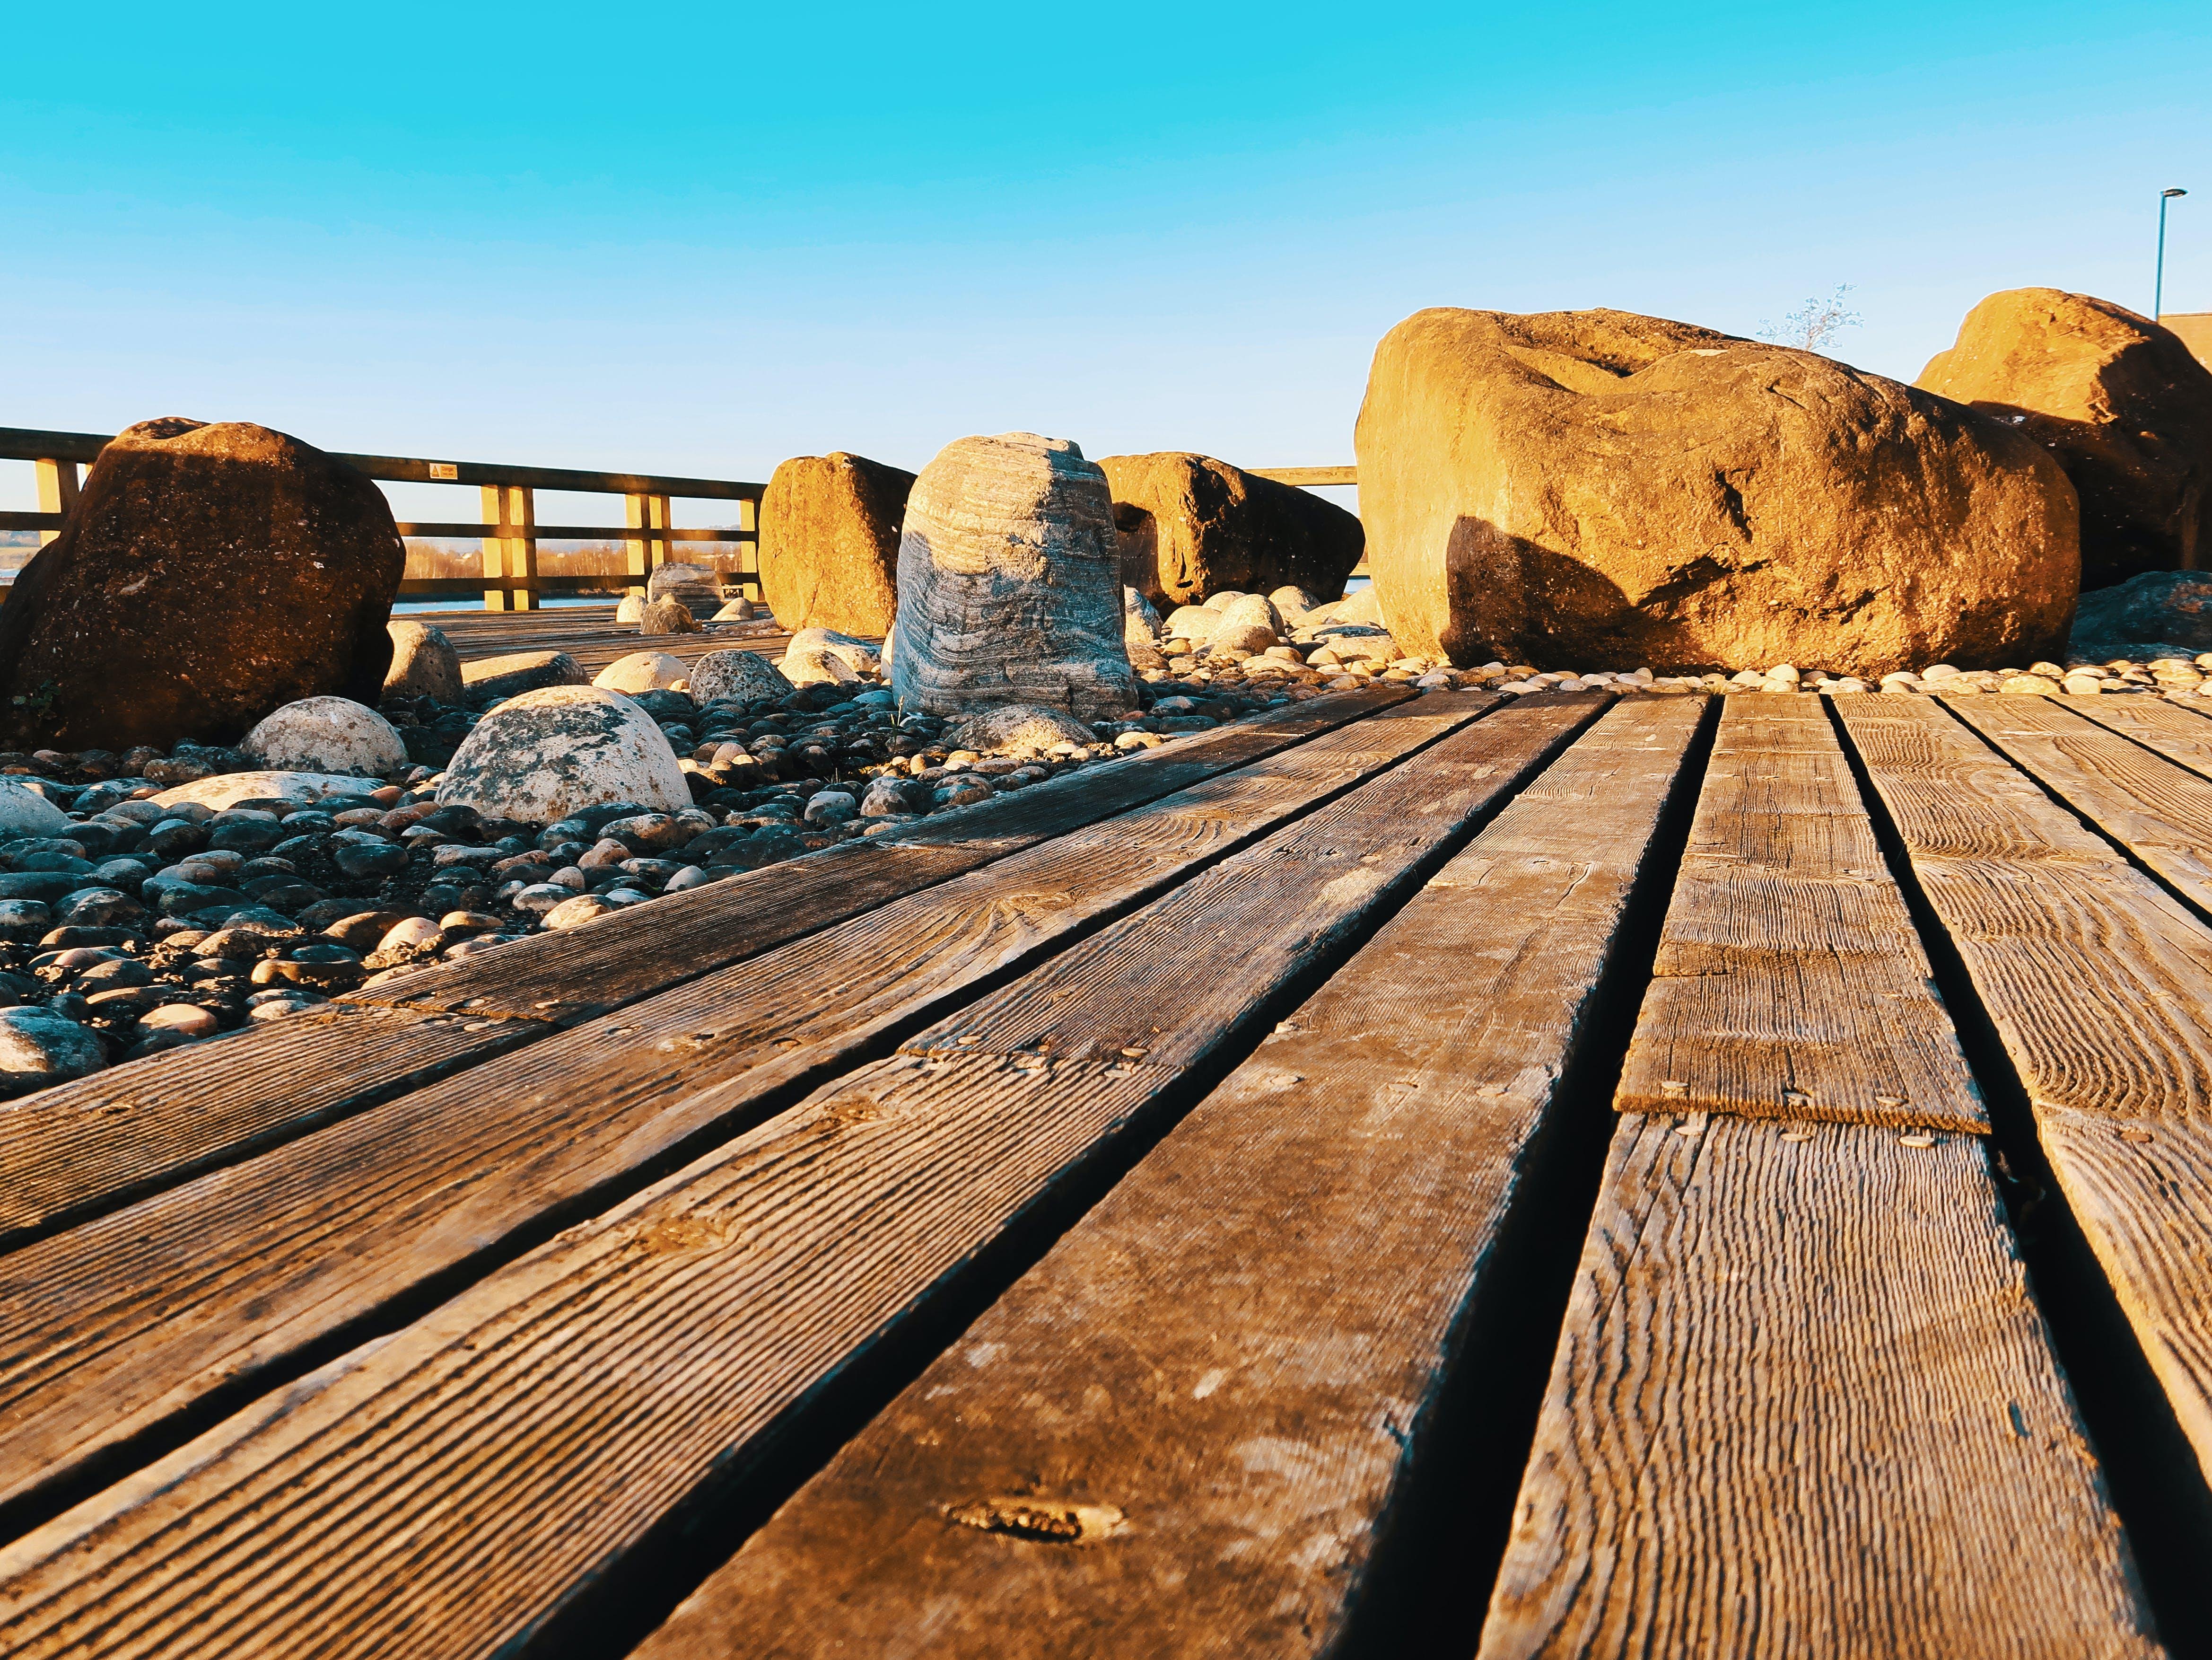 beach, fence, rocks